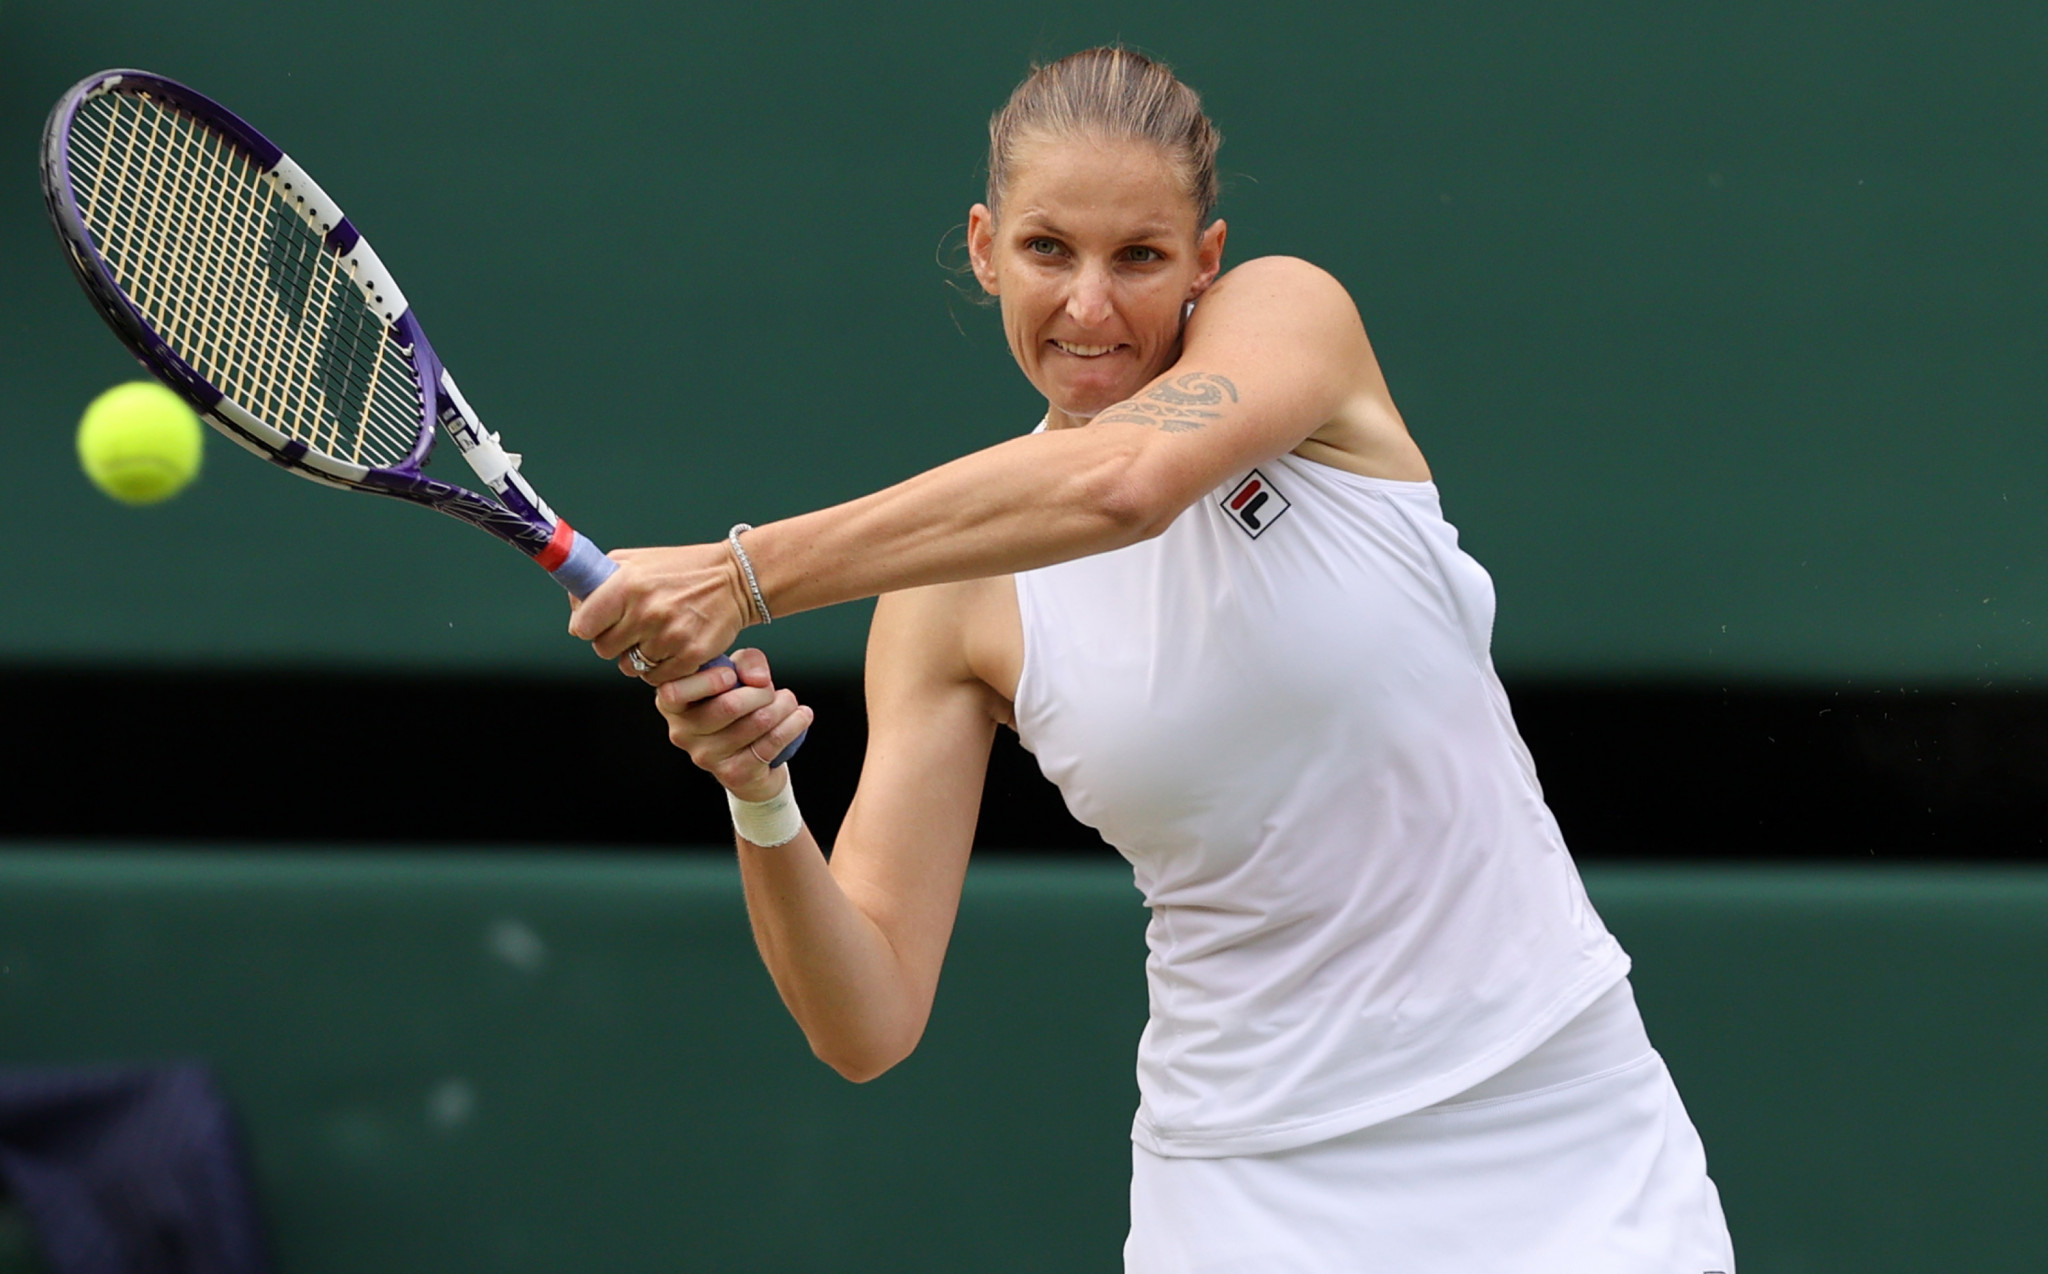 Pliskova defeats Sabalenka to set up Wimbledon women's singles final against top seed Barty